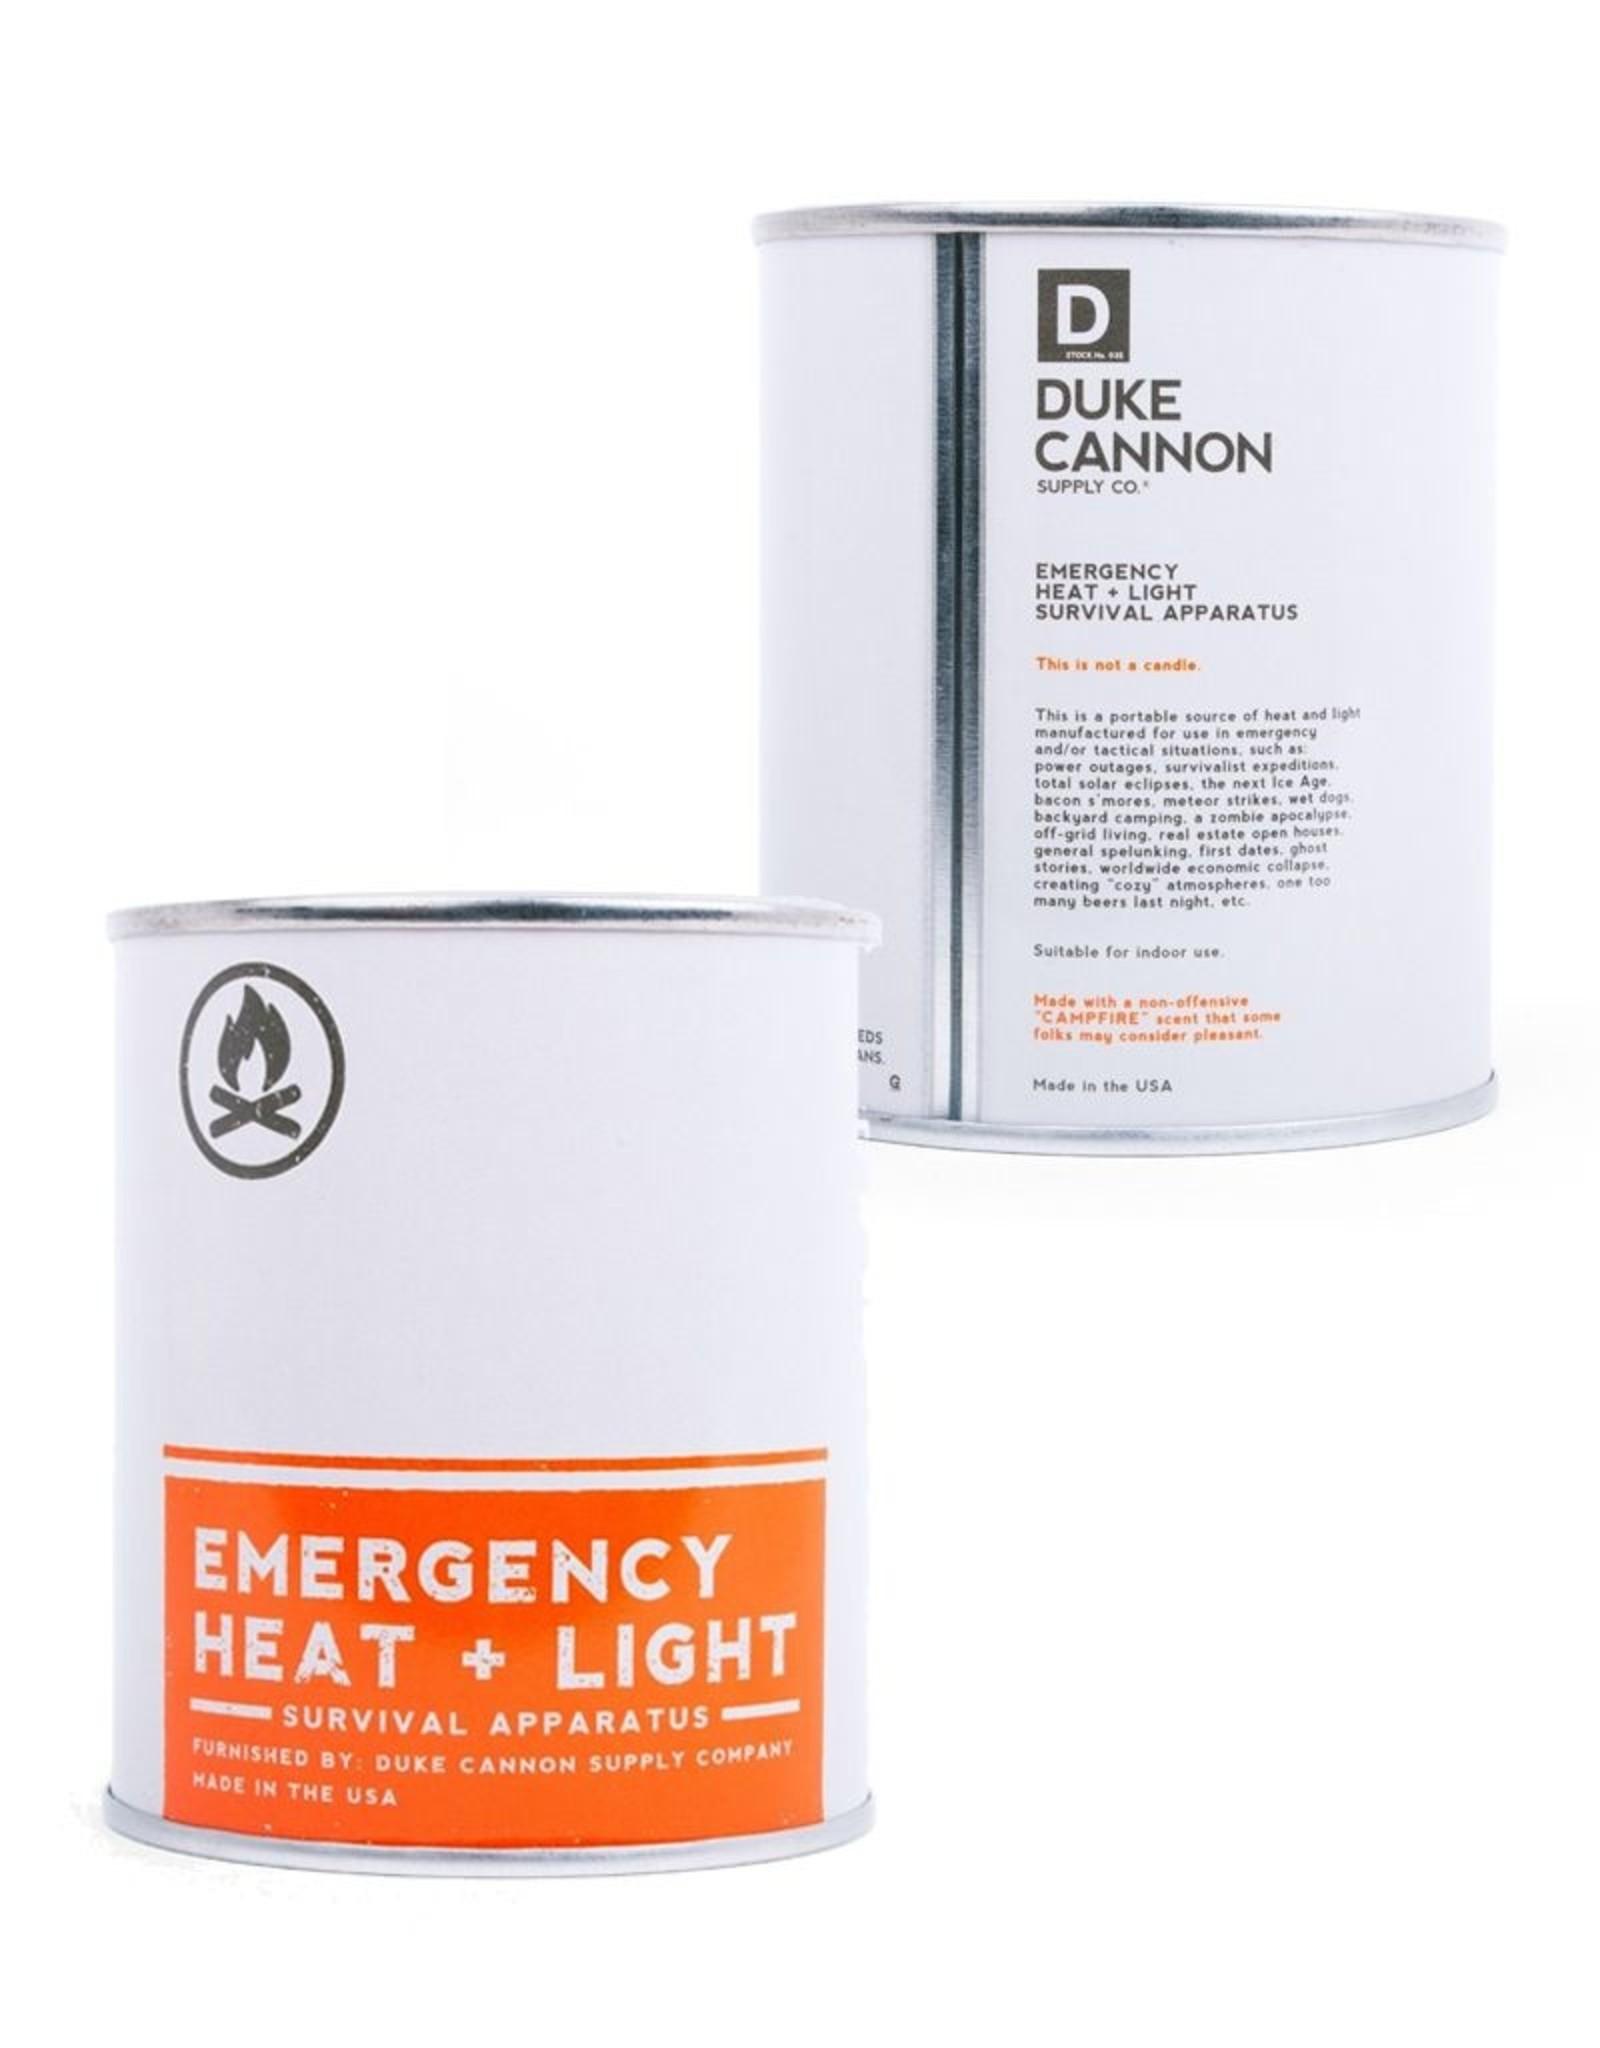 Duke Cannon Emergency Heat + Light Candle